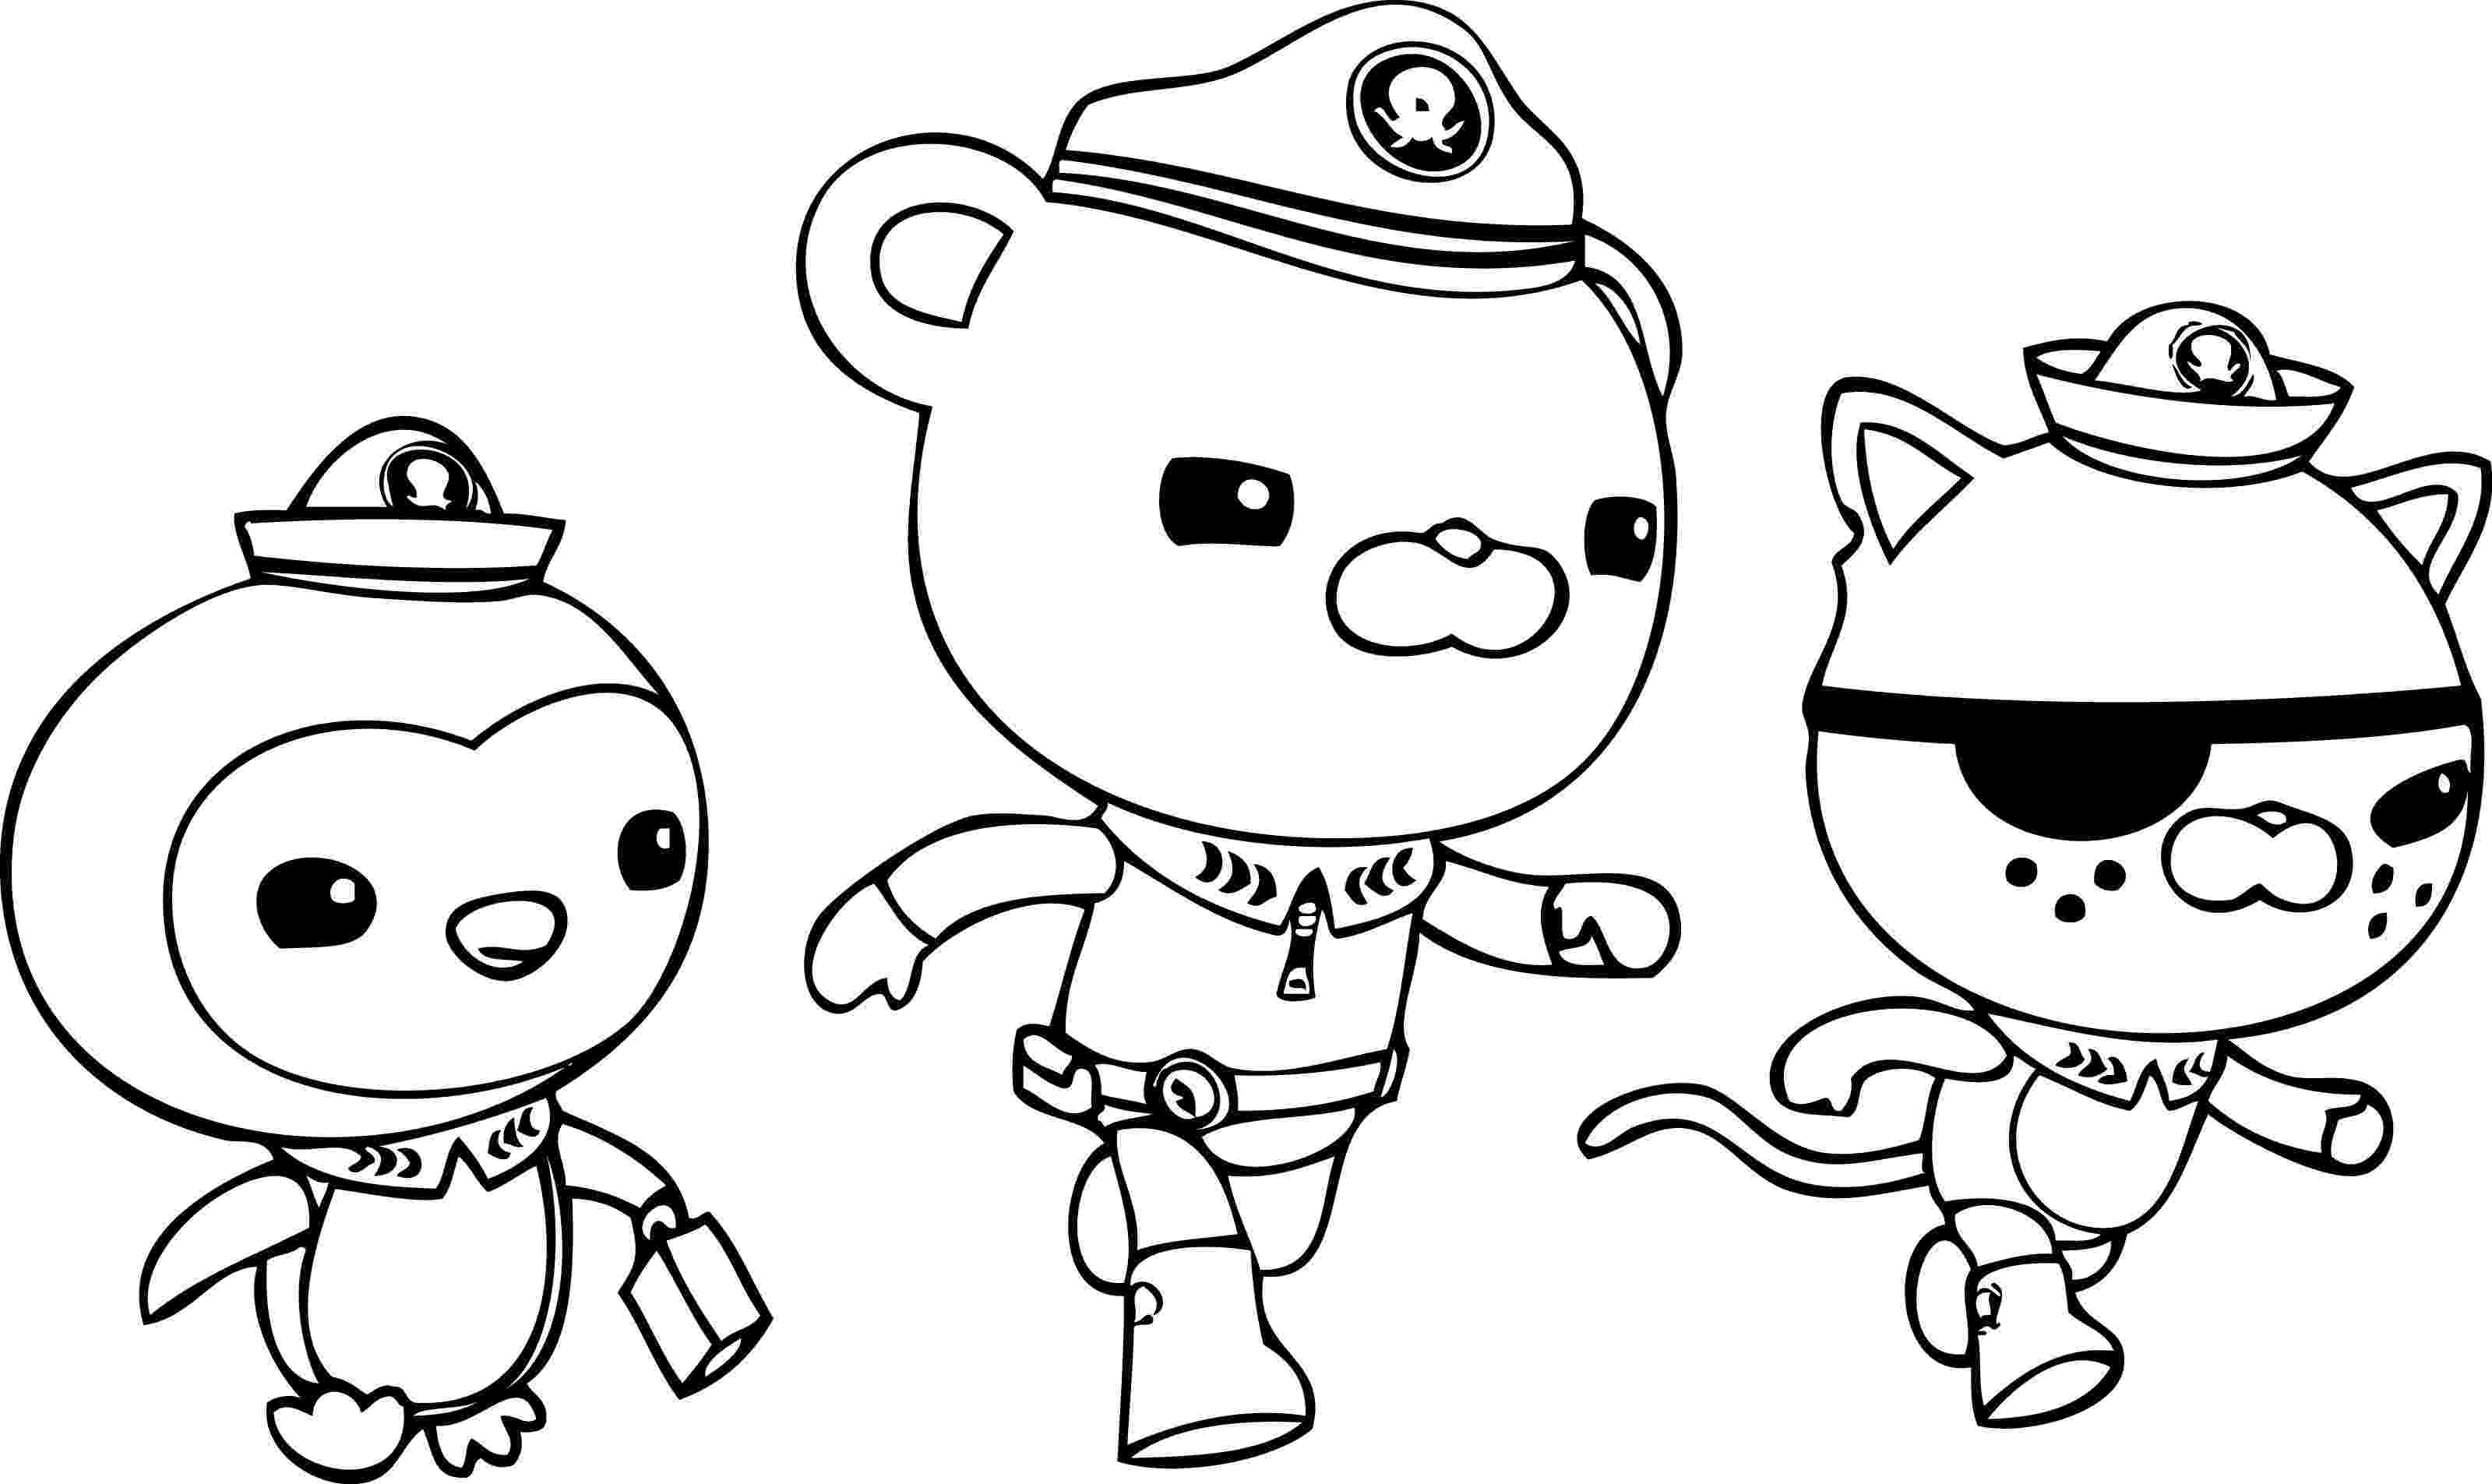 octonauts colouring print download octonauts coloring pages for your kids octonauts colouring